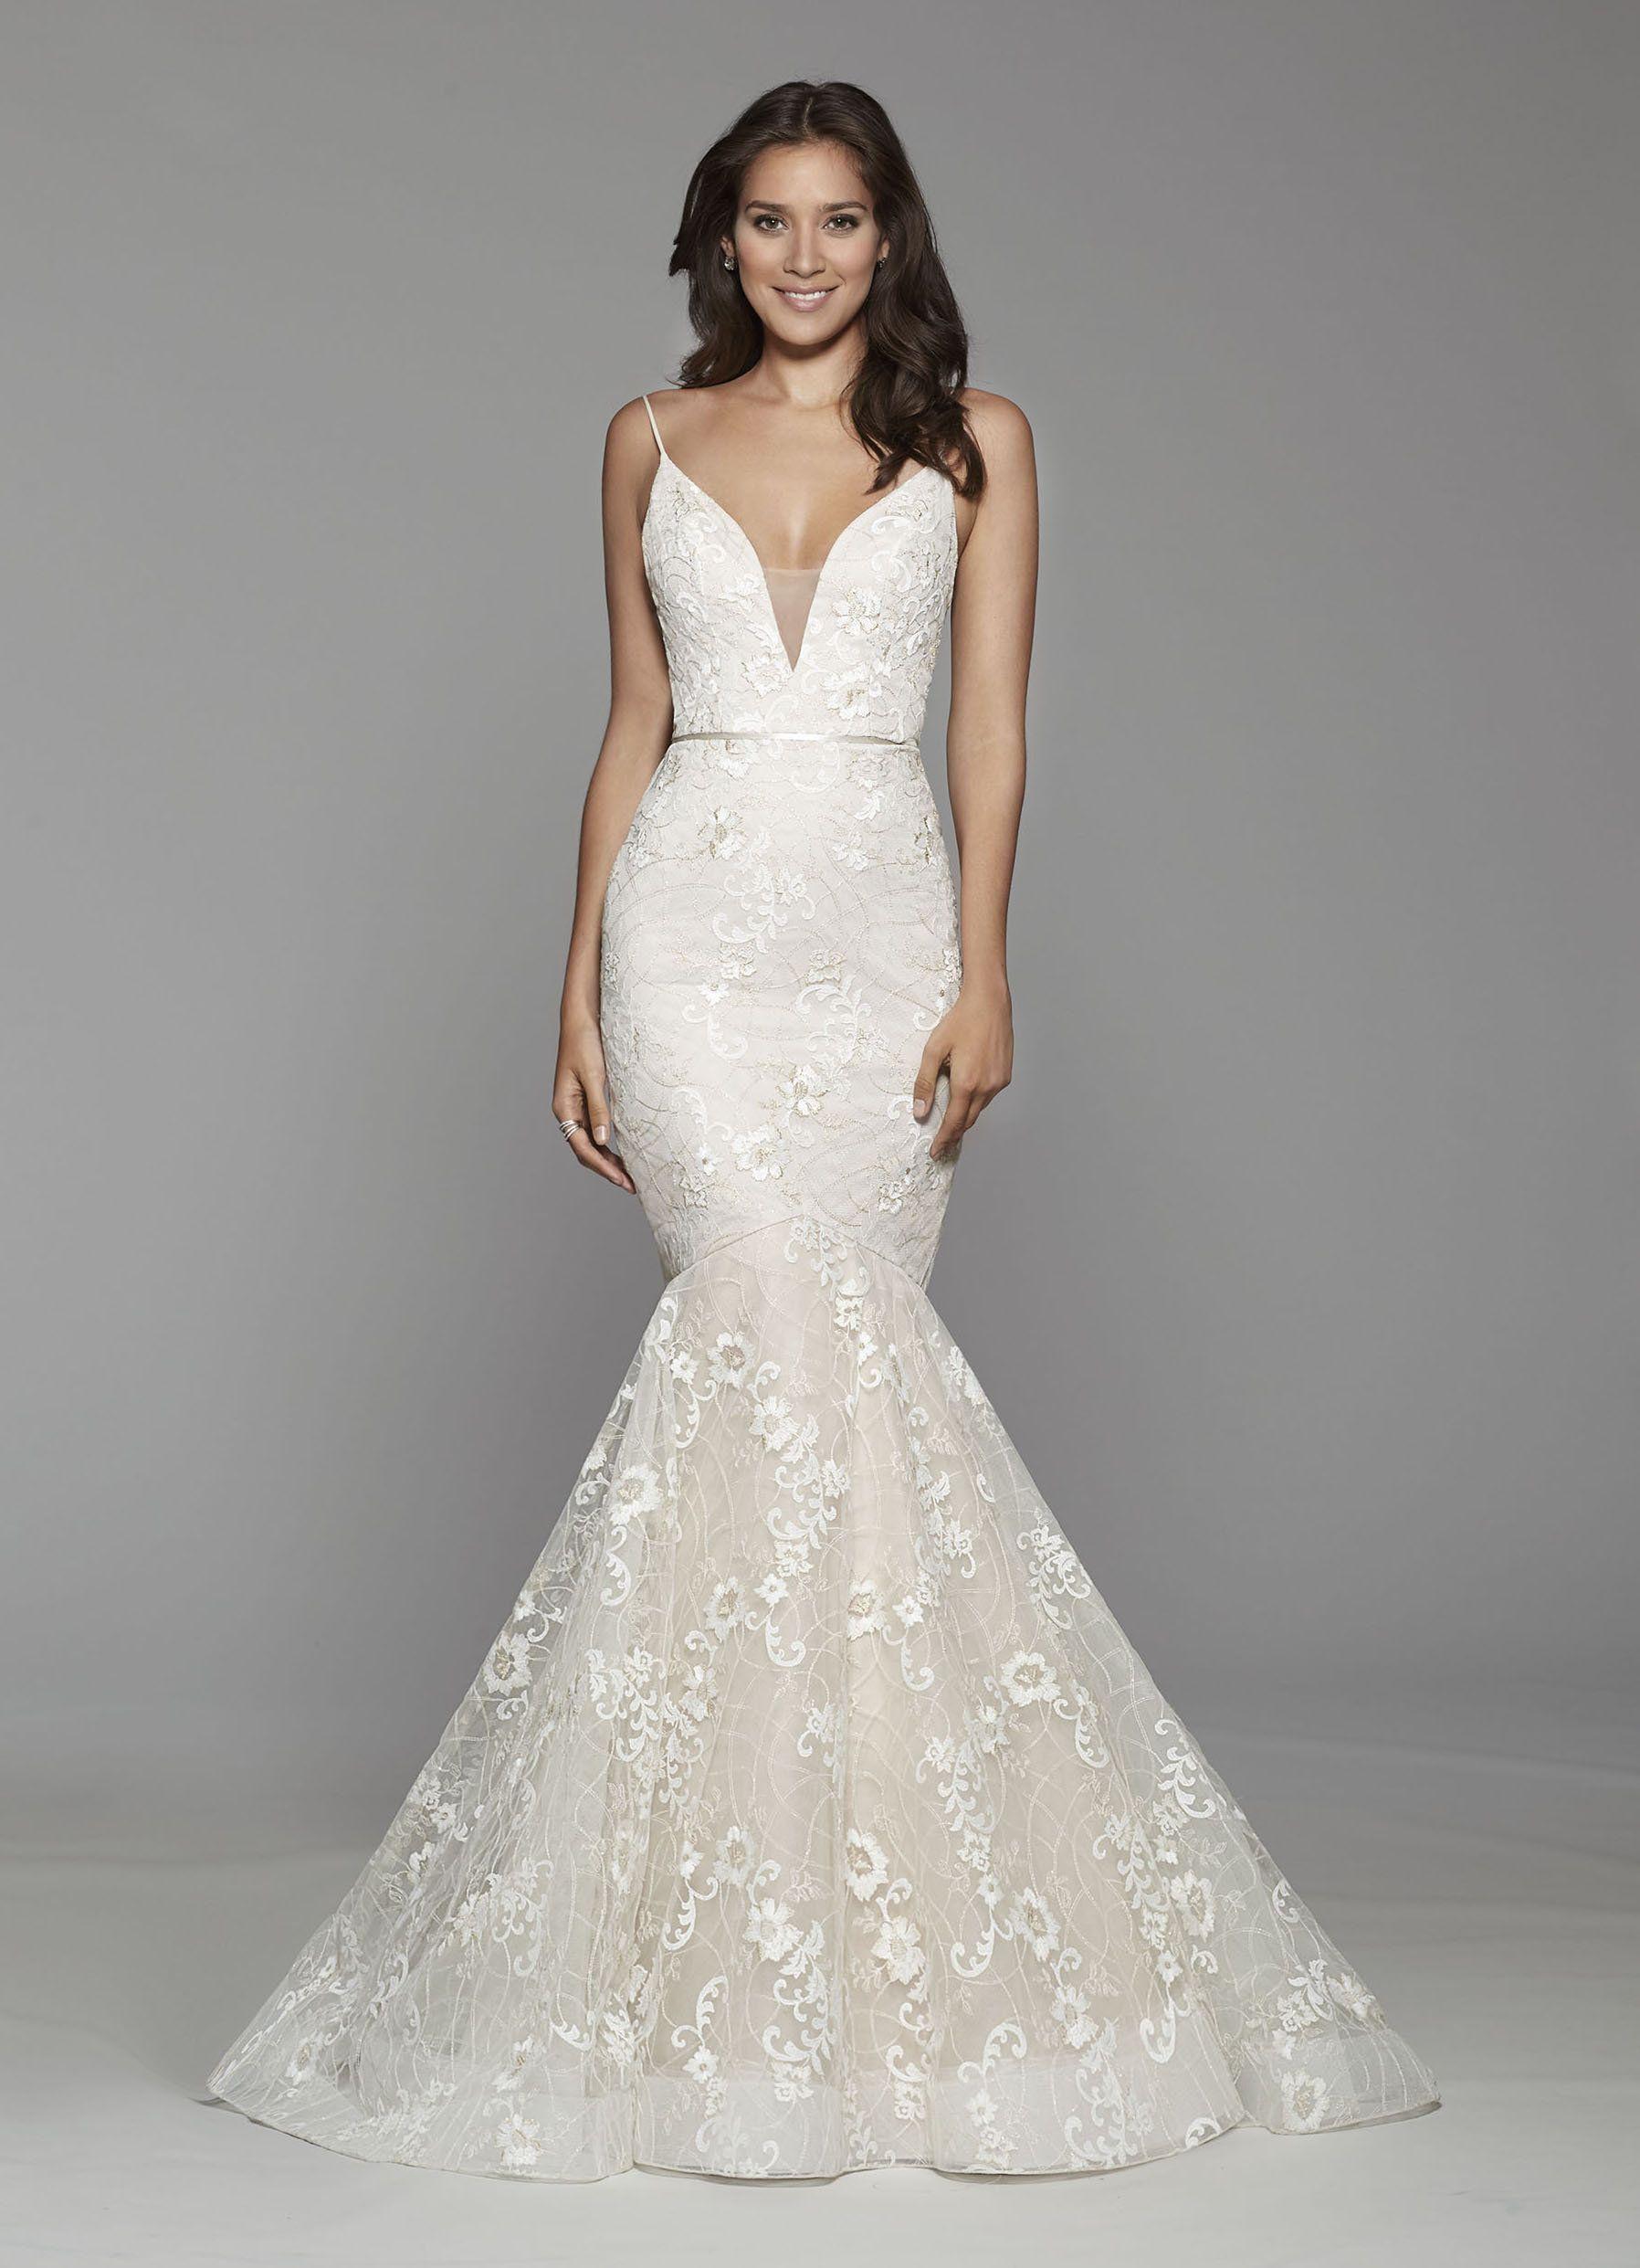 Style lookbook front a wedding dresses pinterest